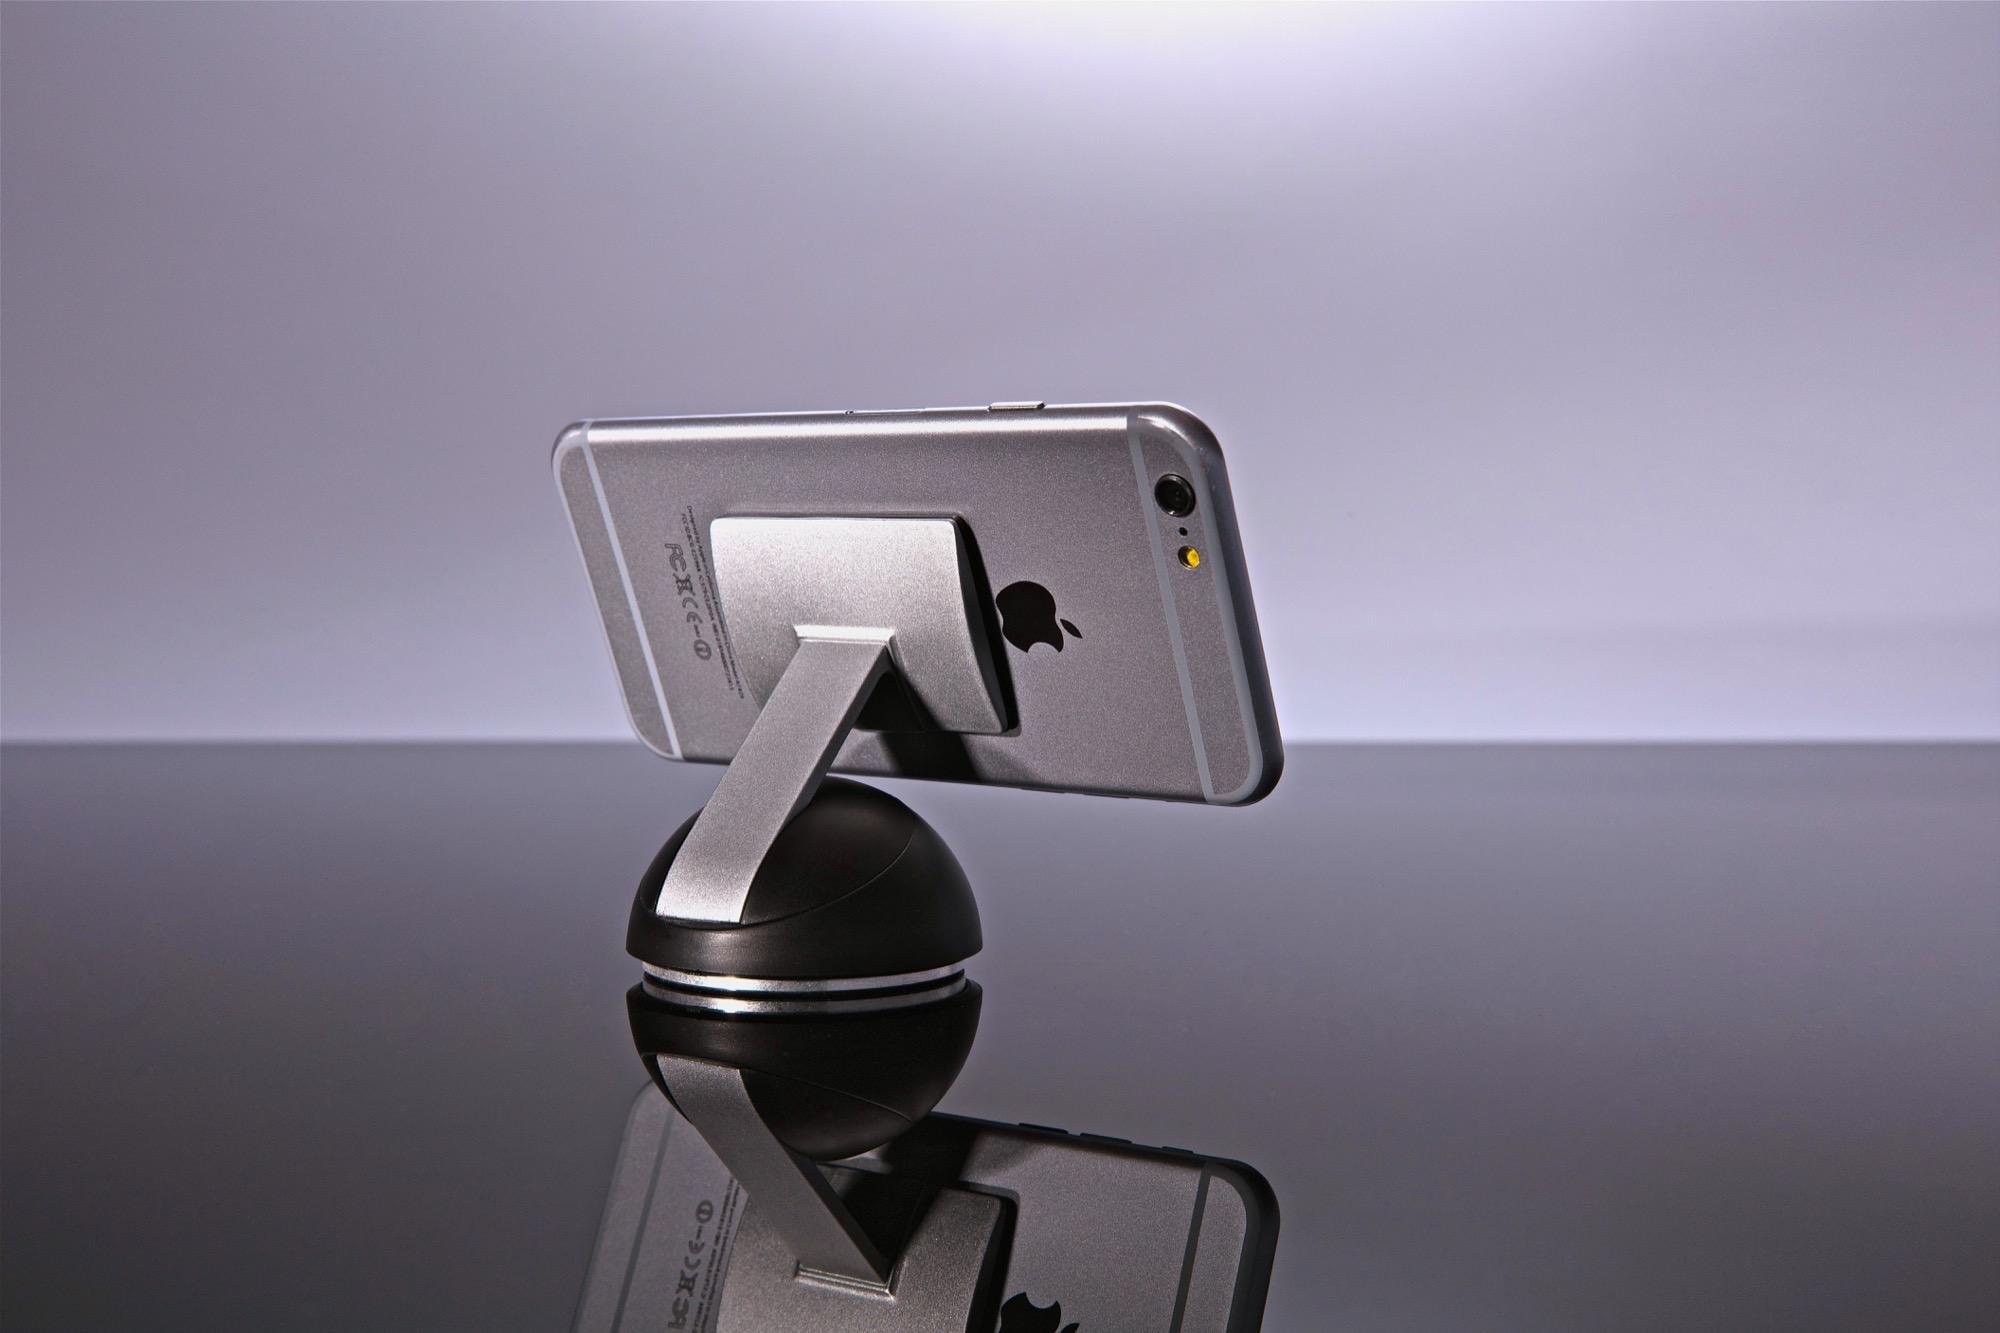 S1 360° Swivel Mount - MicroSuction Phone Dock